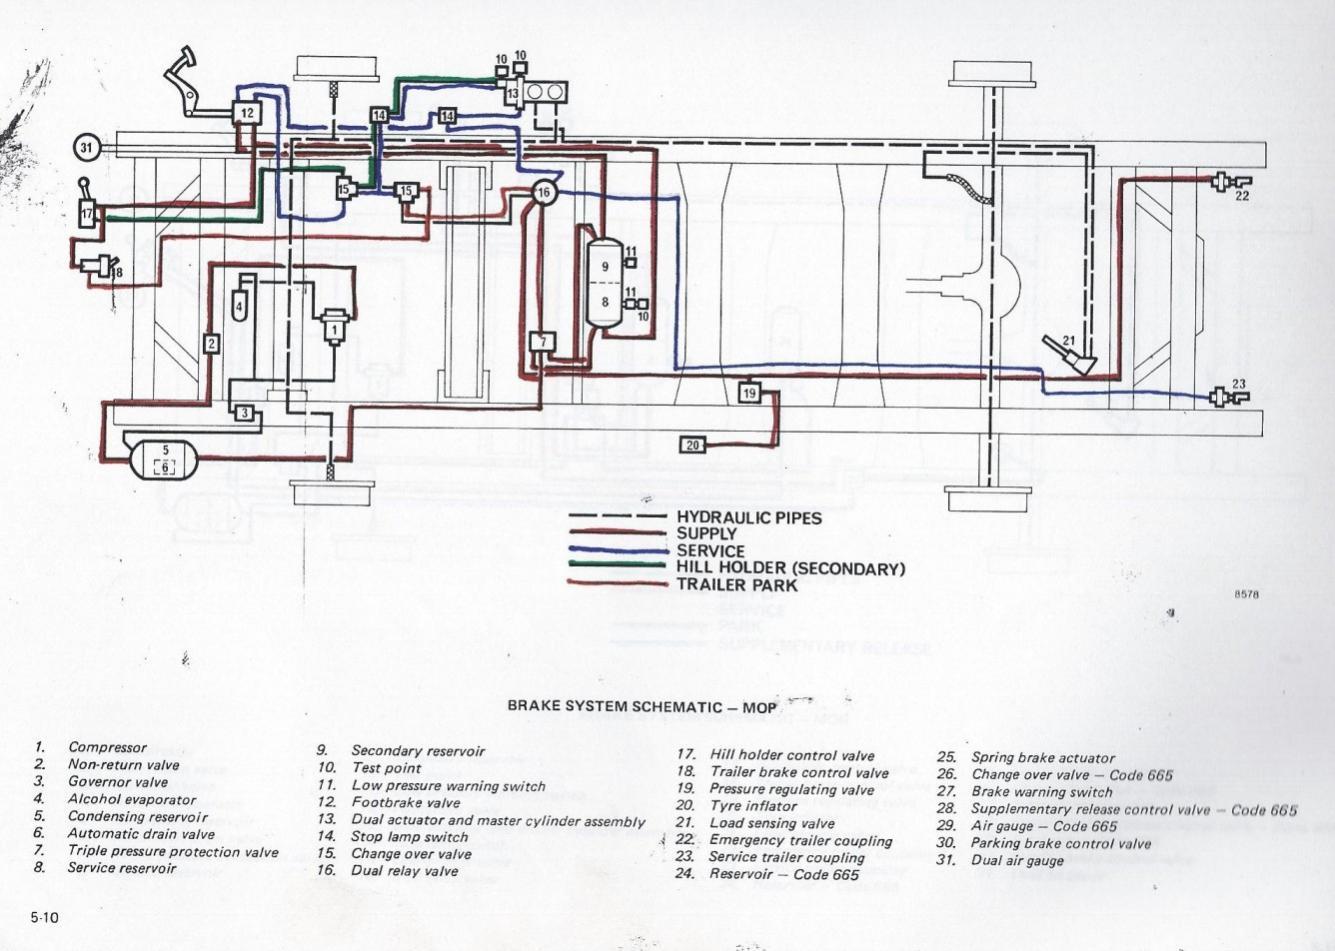 Bedford Mj Air Brake Problem British Vehicles Hmvf Historic Electric Relay Mjp Schematic